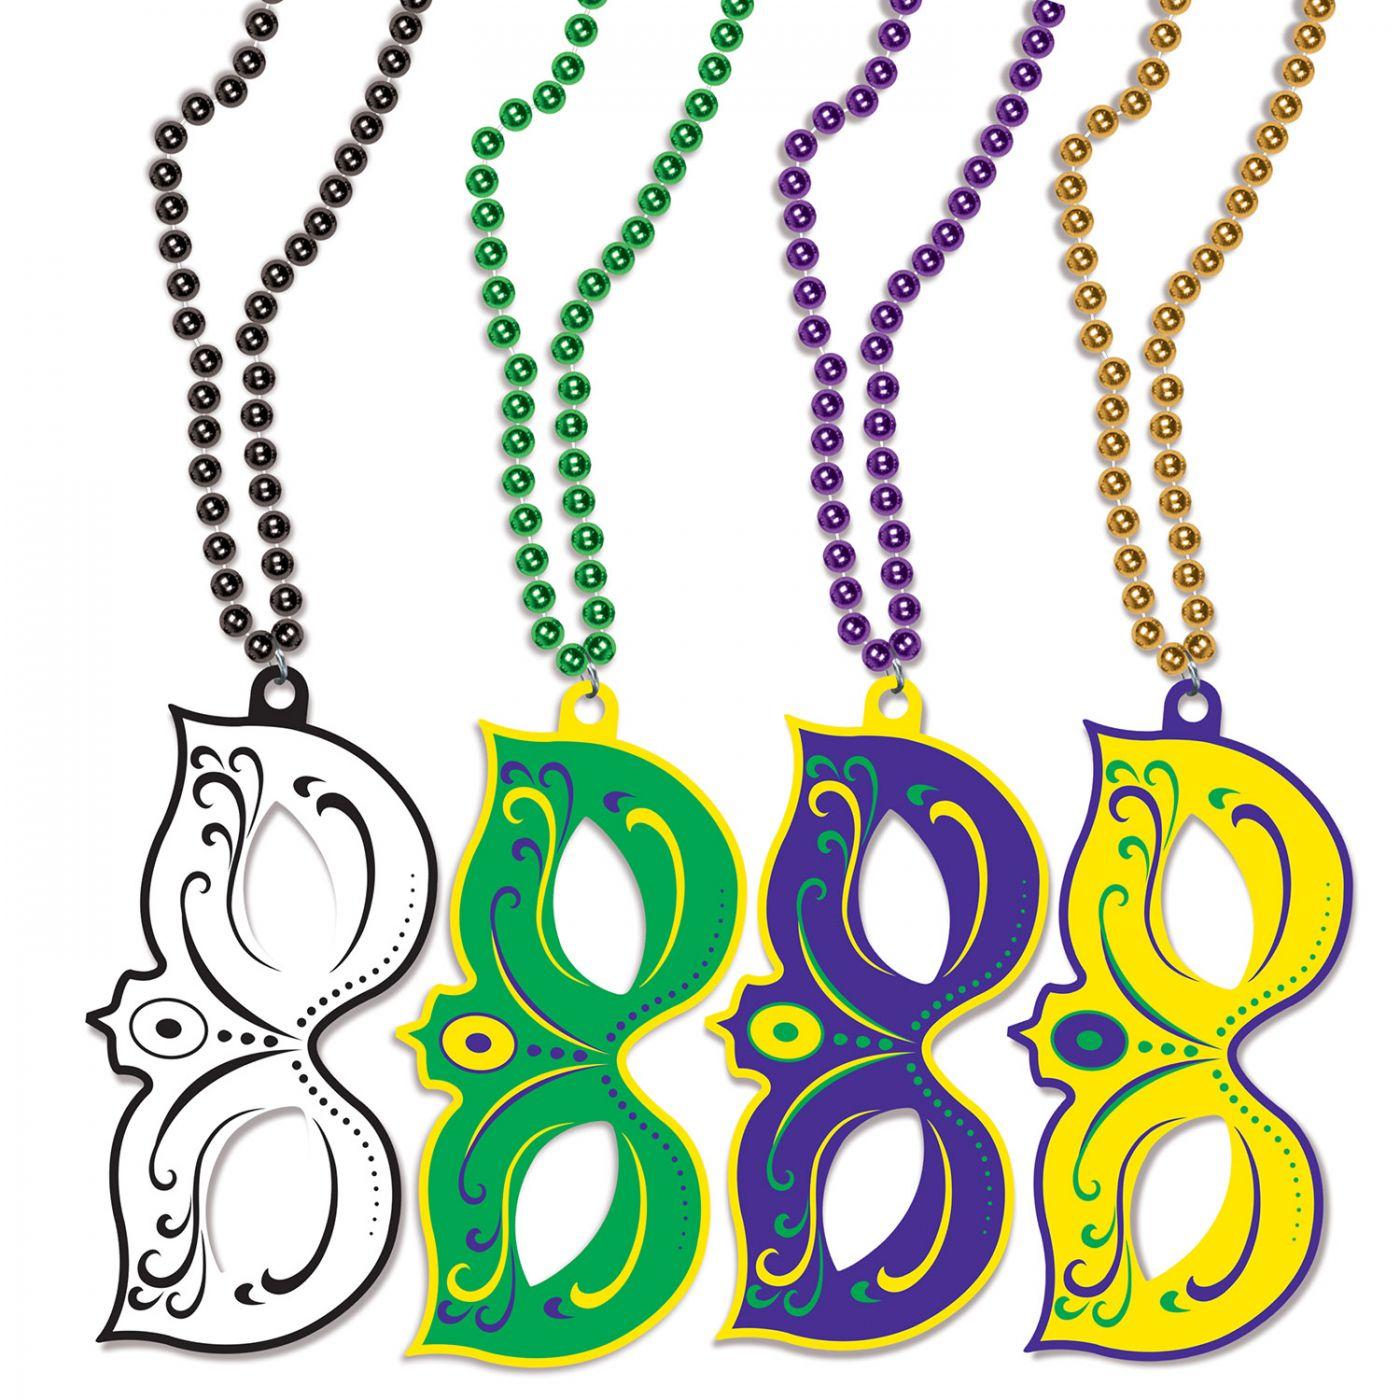 Mardi Gras Masks w/Beads image